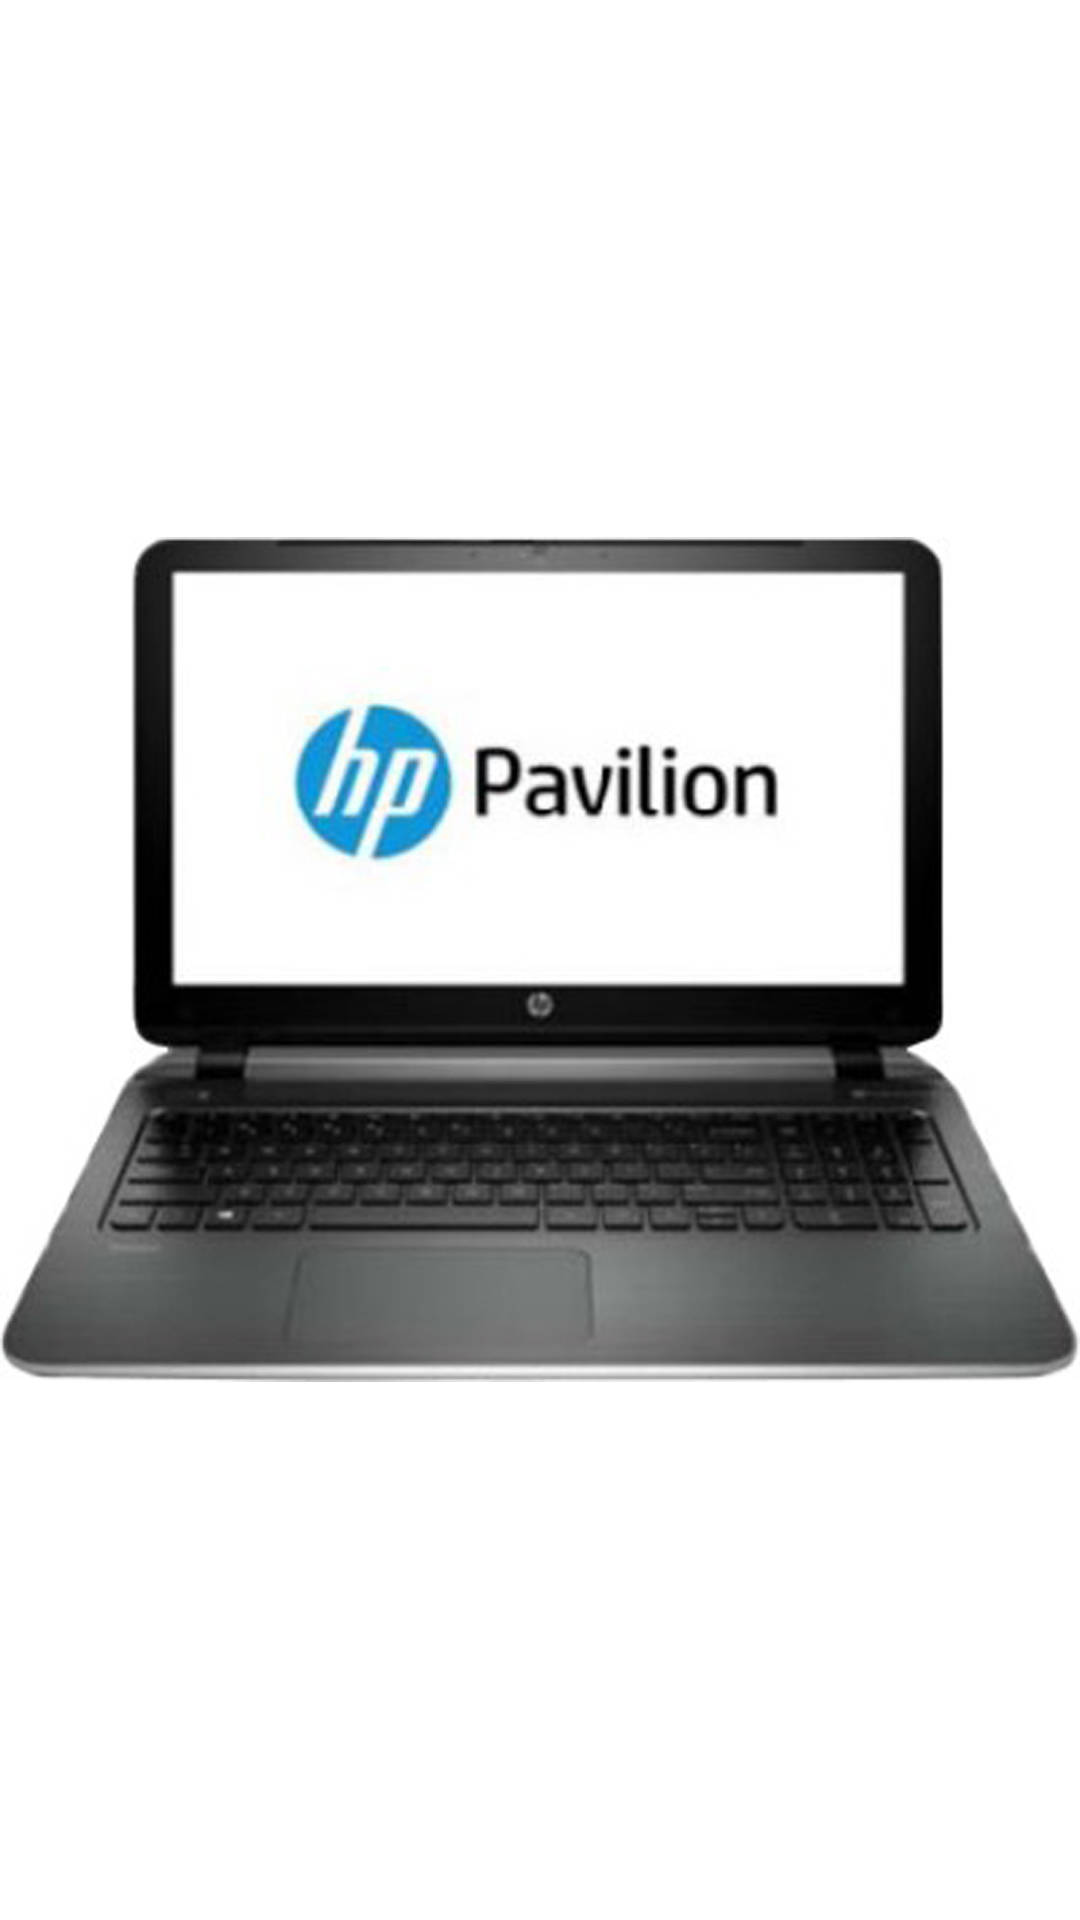 HP Pavilion 15 p275TX Notebook (L2Z04PA) Image